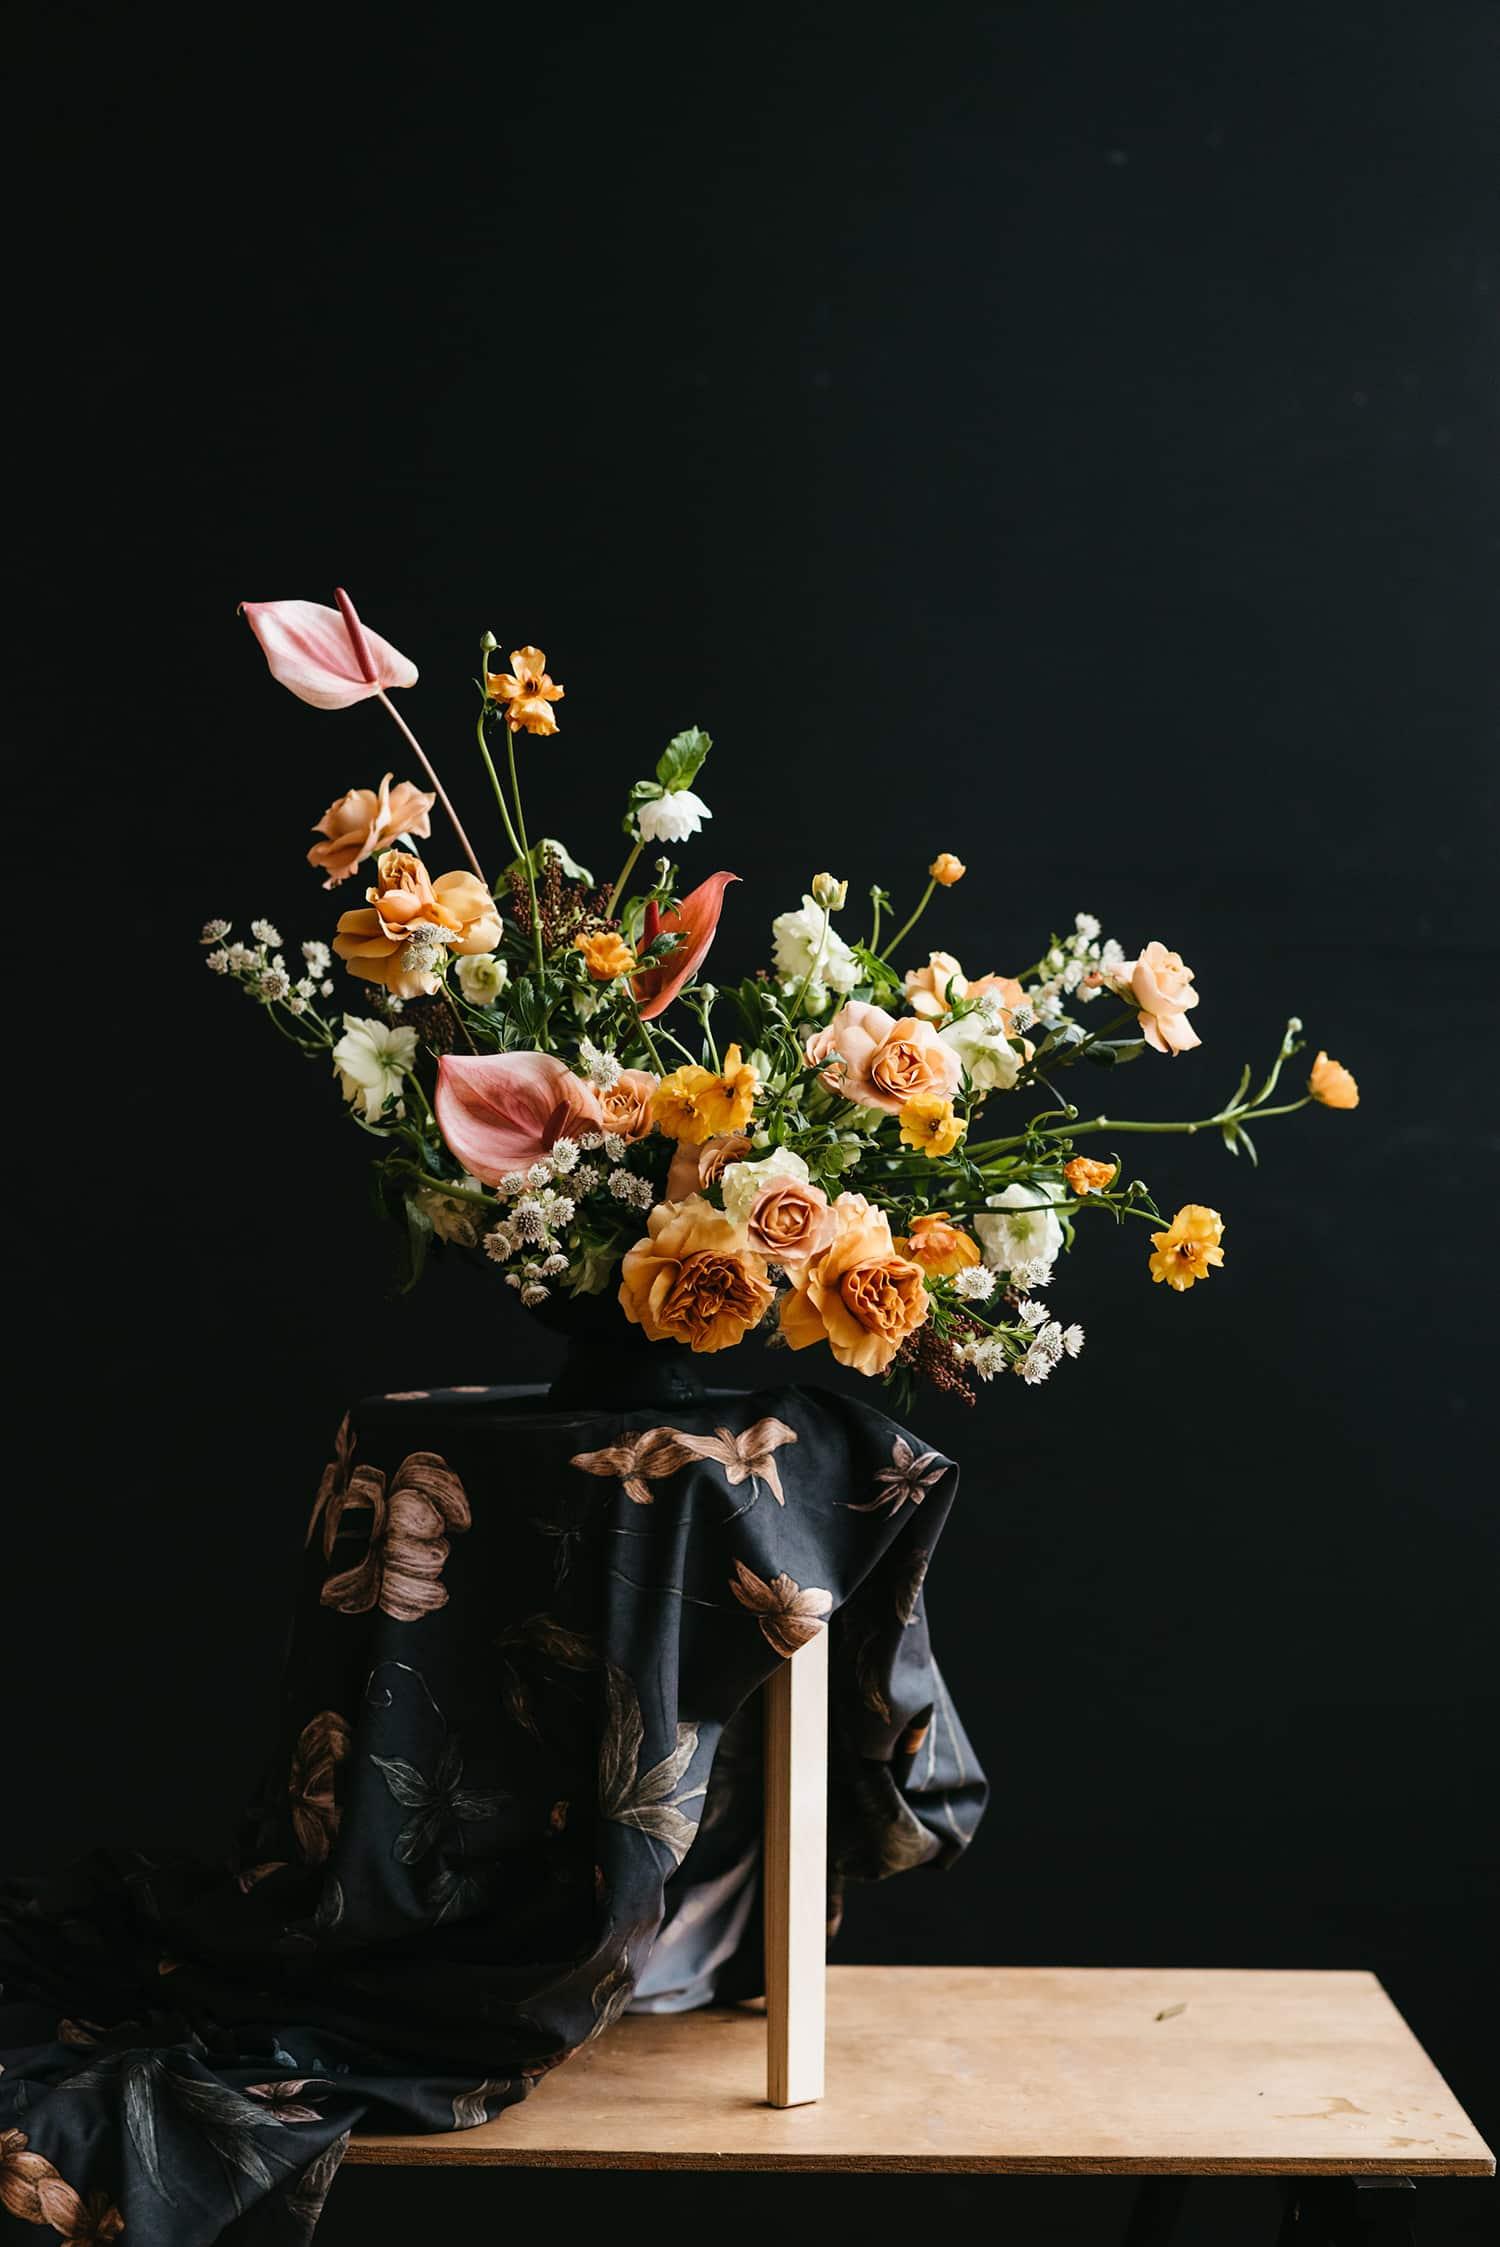 Floral designer and Portland florist Color Theory Collective demonstrates flower arranging.